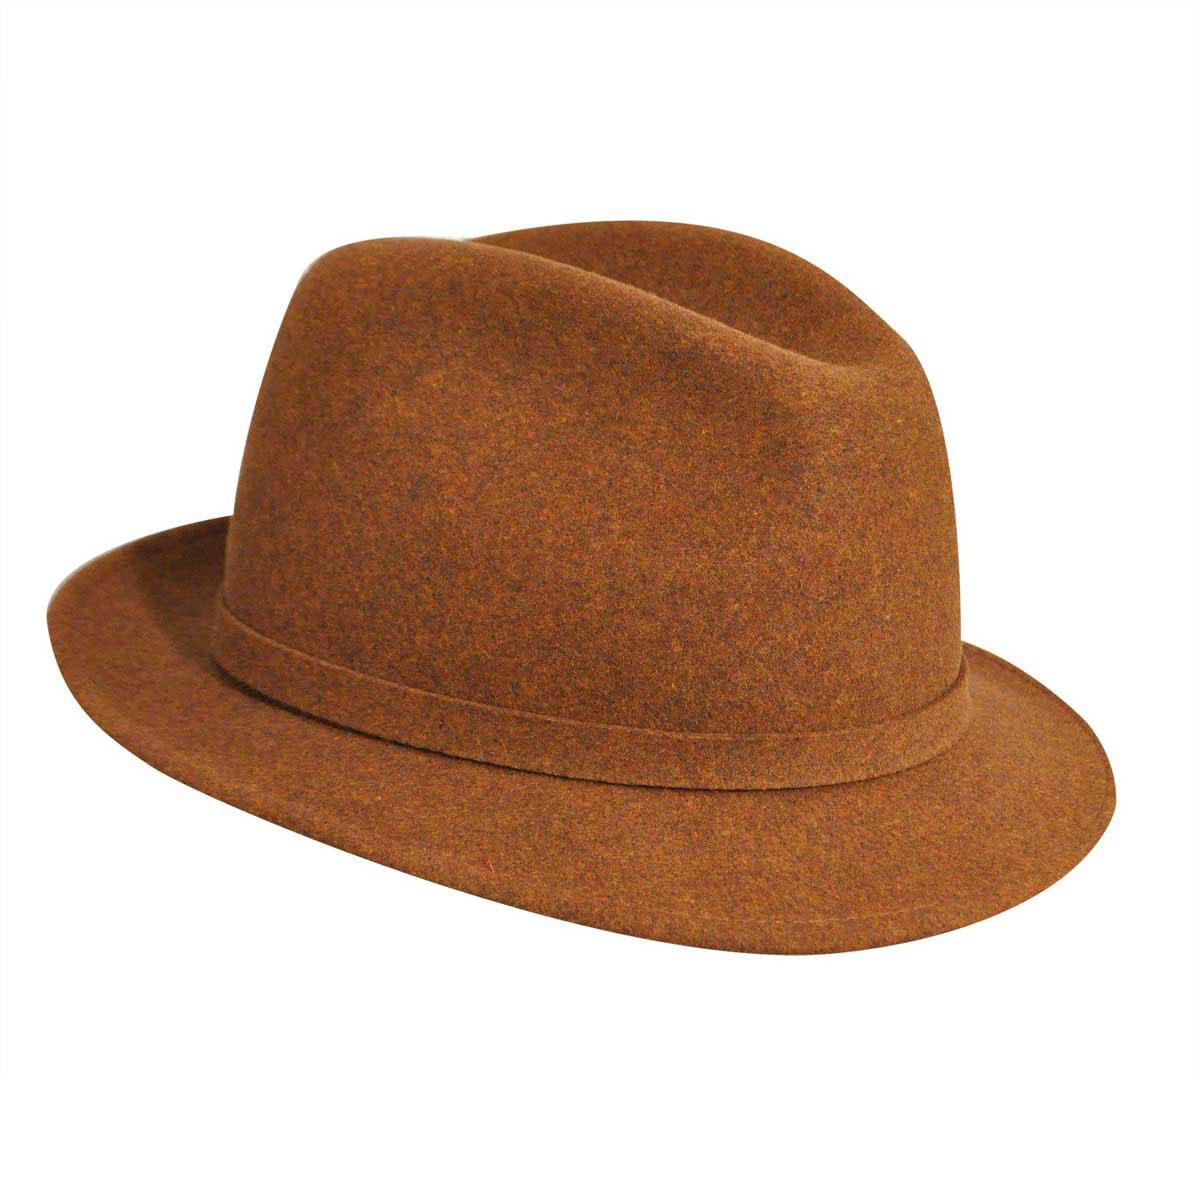 06502d9b06f Pantropic Mens Litefeltâ Charlie Stingy Brim Fedora Hat 750660018227 ...